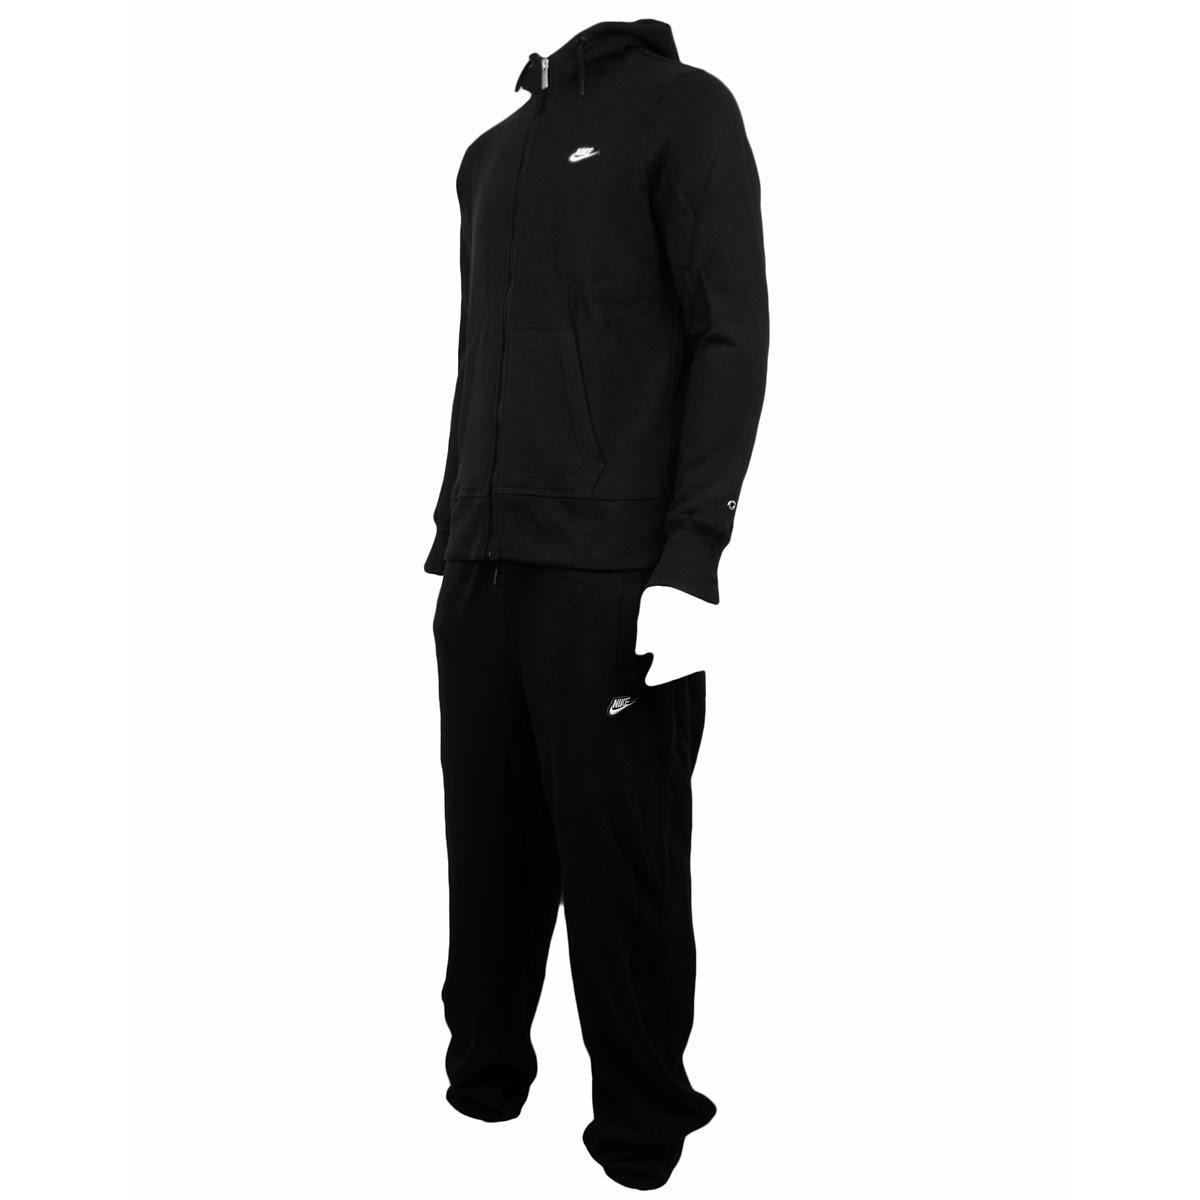 mens boys nike black fleece full jogging suit tracksuit